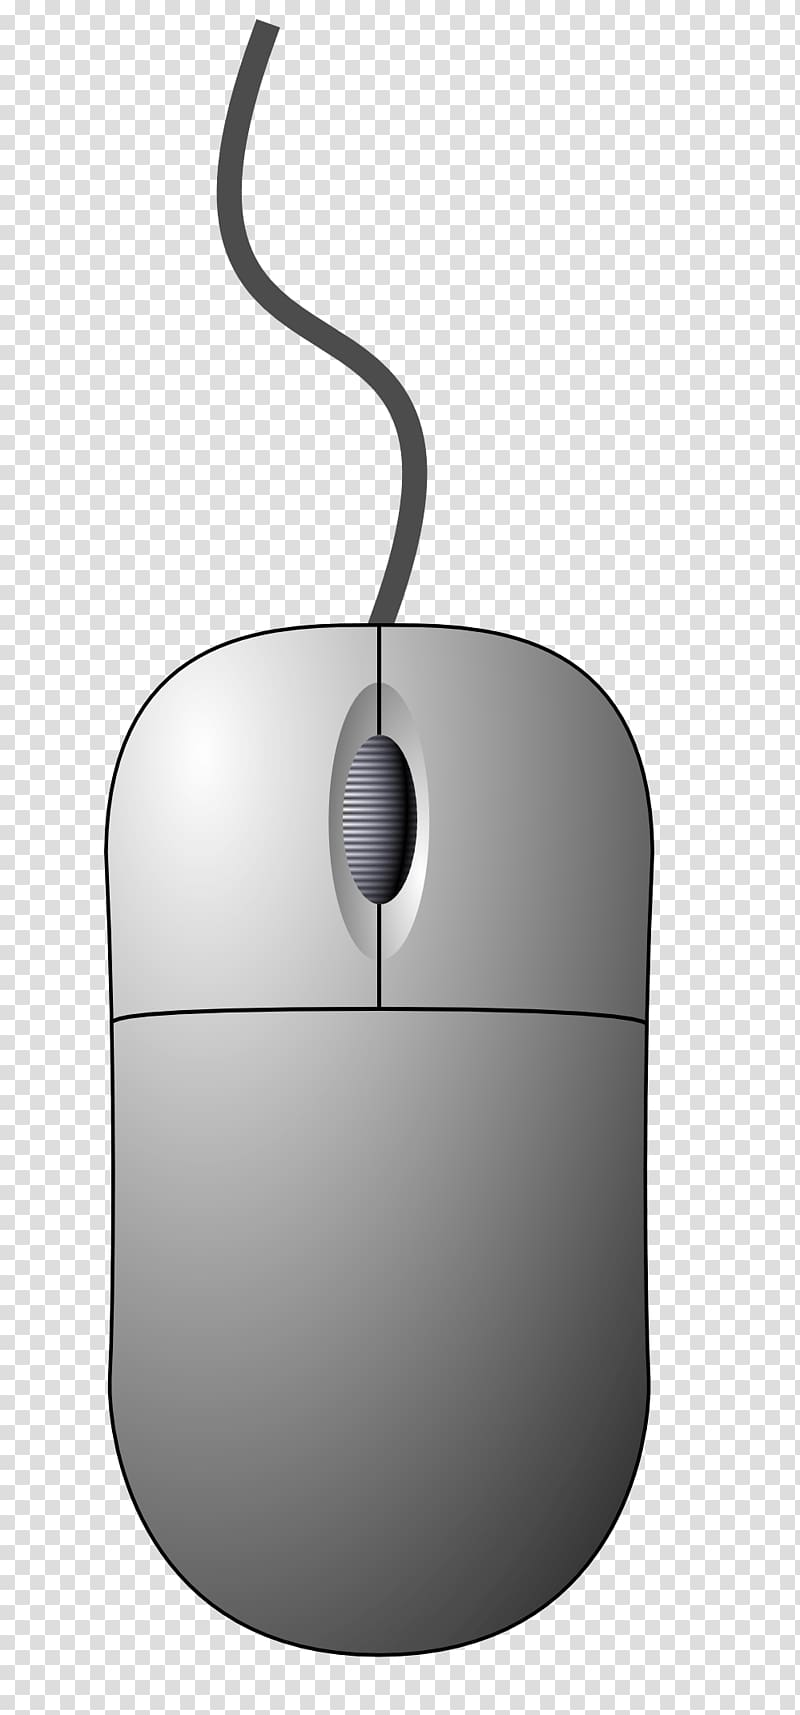 Pc mouse clipart clip freeuse Computer mouse Computer keyboard Mouse button Mickey Mouse ... clip freeuse